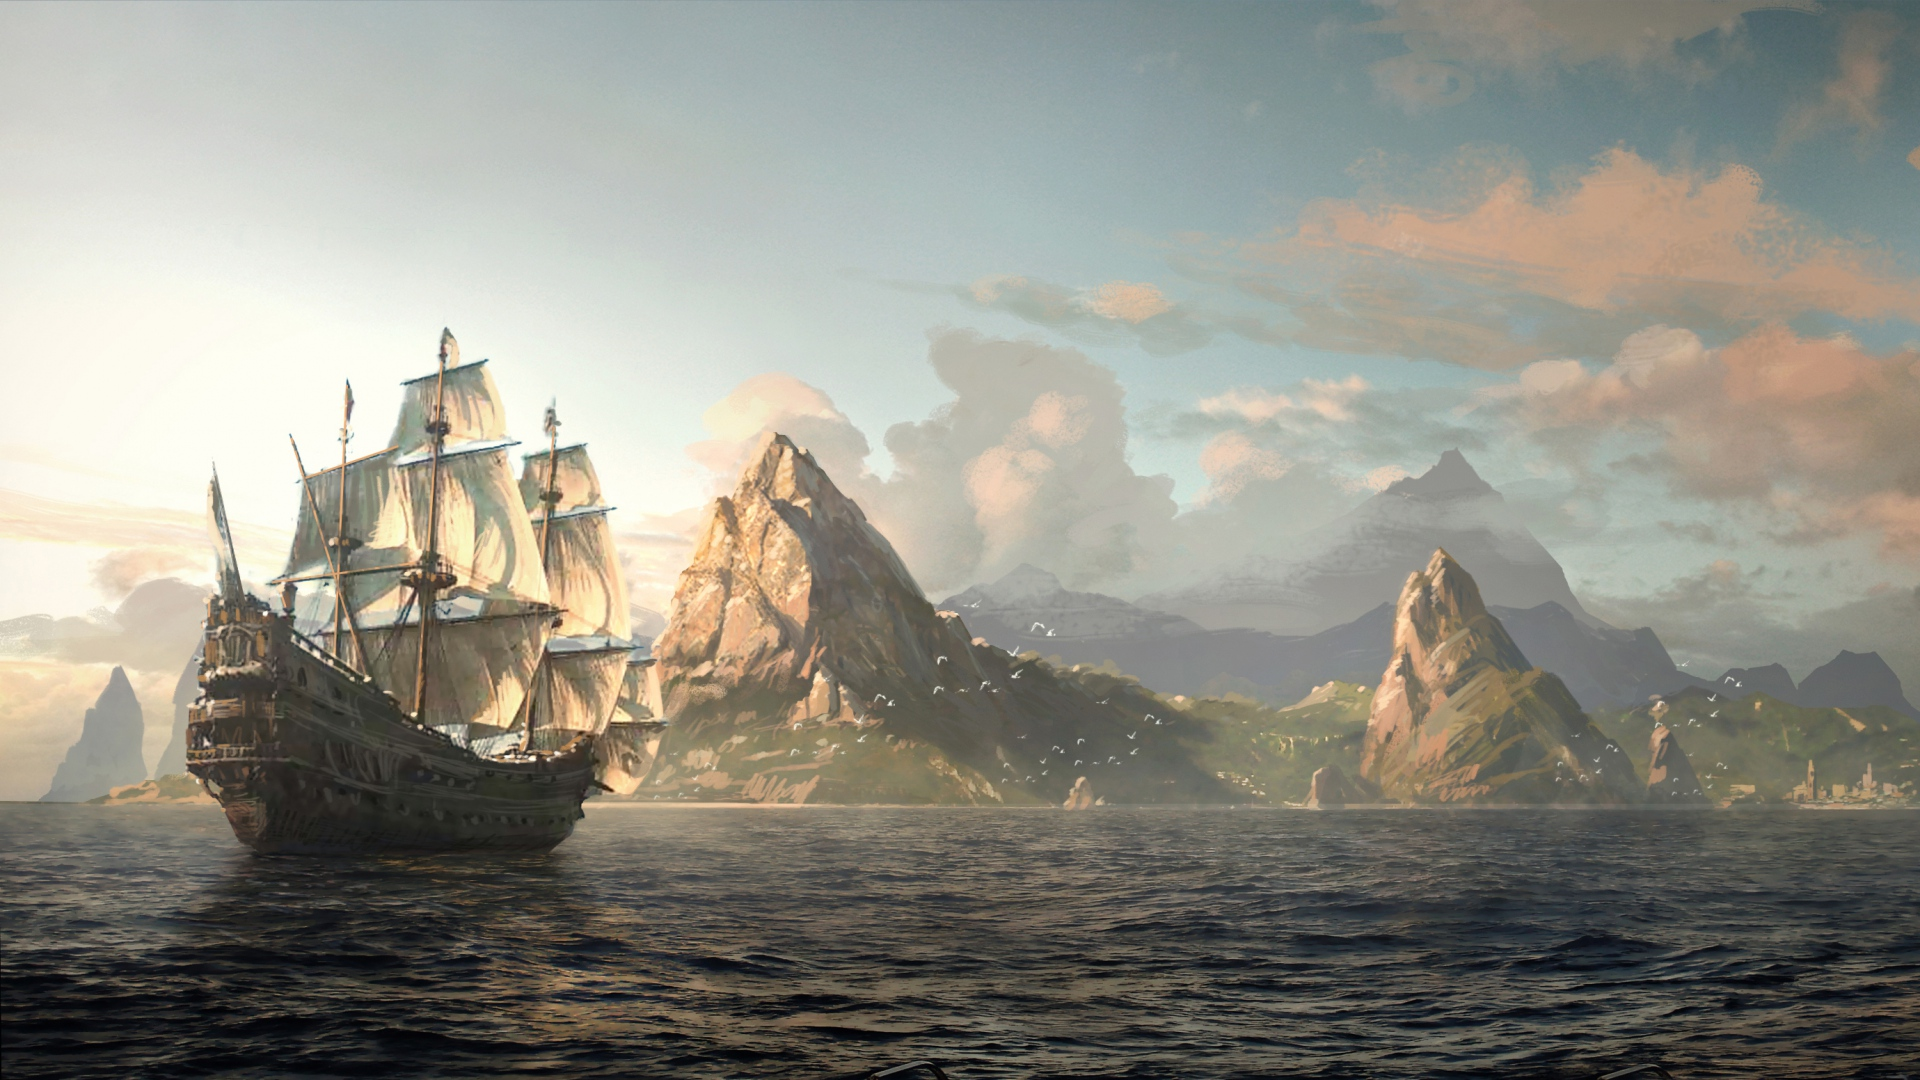 Assassin's Creed IV: Black Flag, ассасин, пират, Эдвард Кенуэй обои скачать